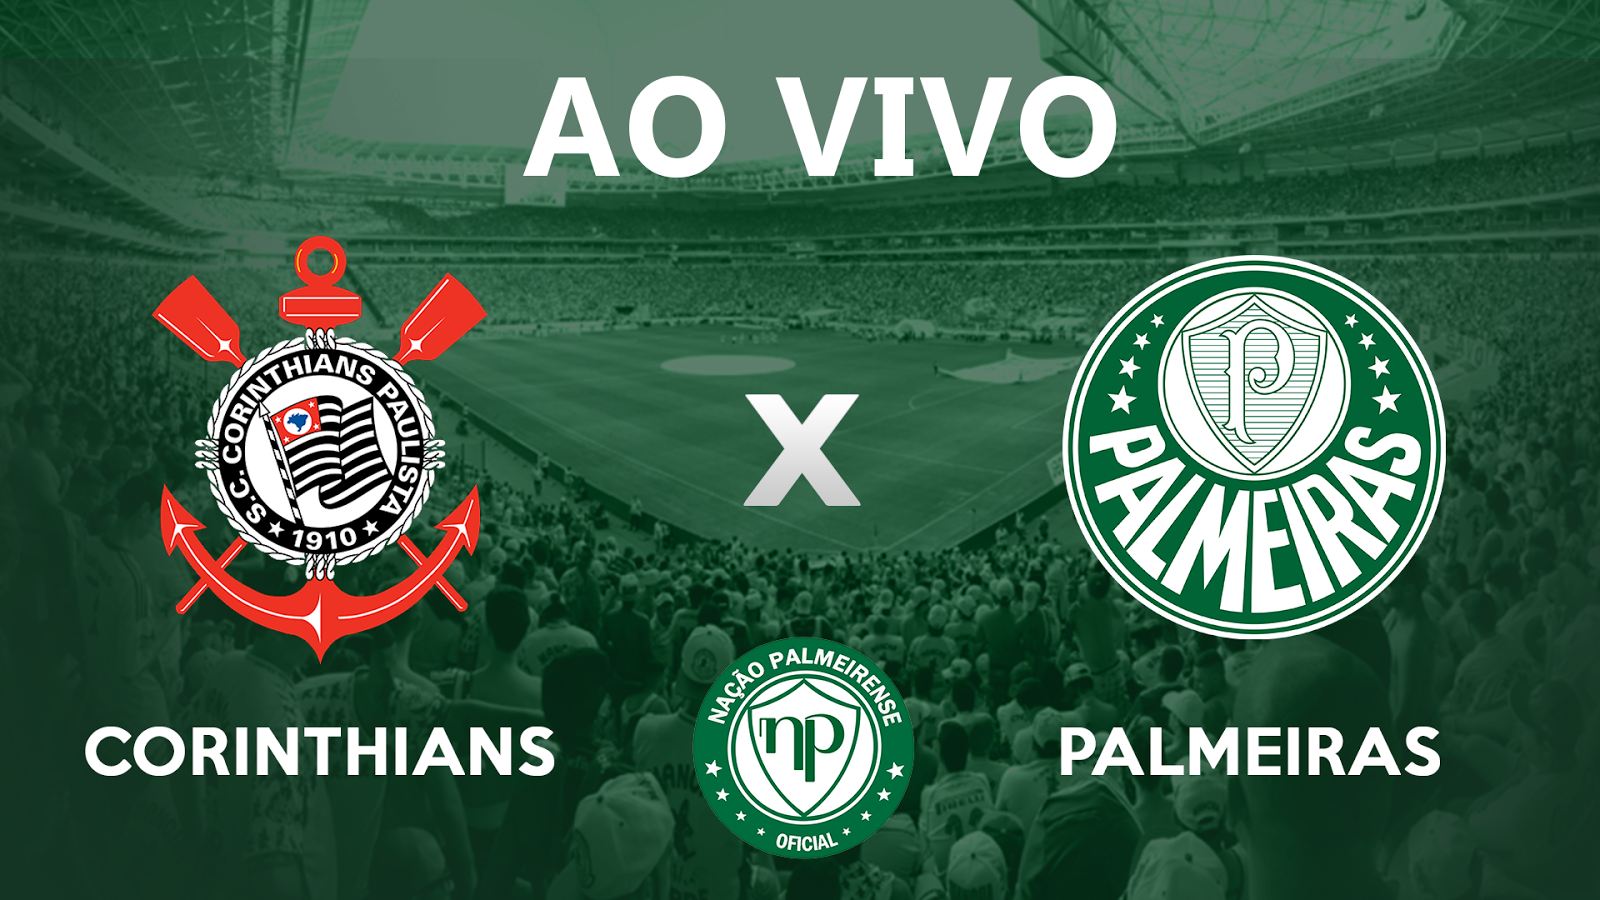 Assistir ao vivo Corinthians x Palmeiras Campeonato ...